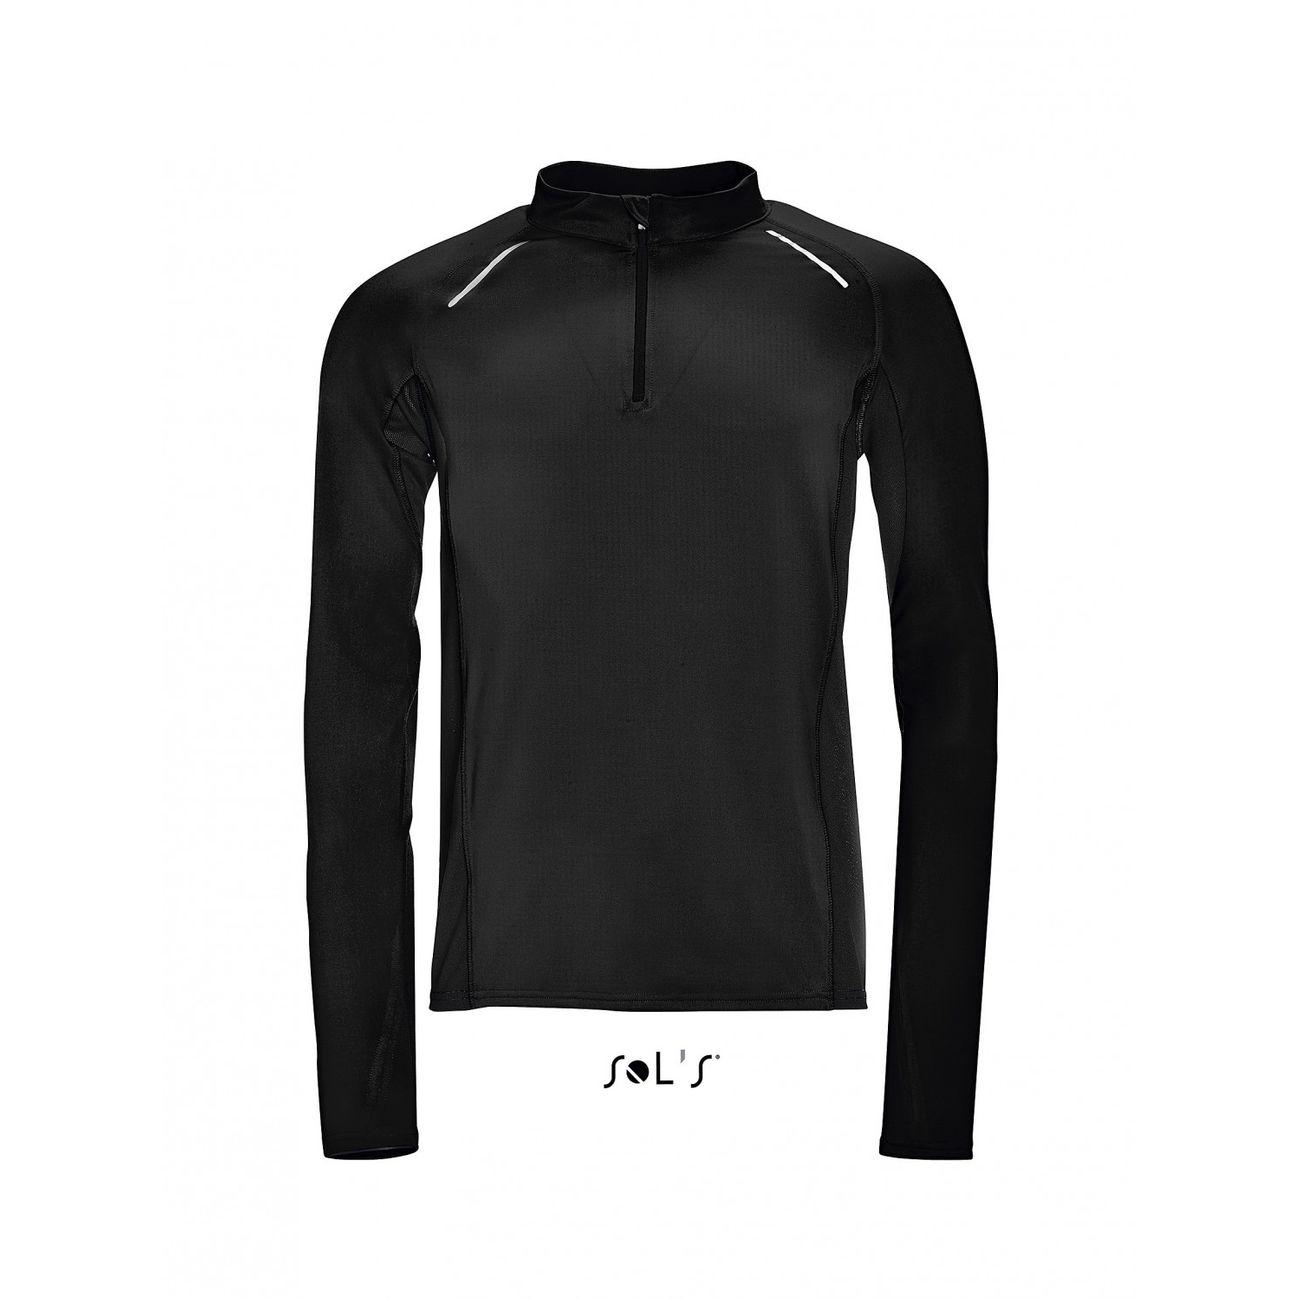 running adulte SOL S t-shirt running manches longues - Homme - 01416 - noir